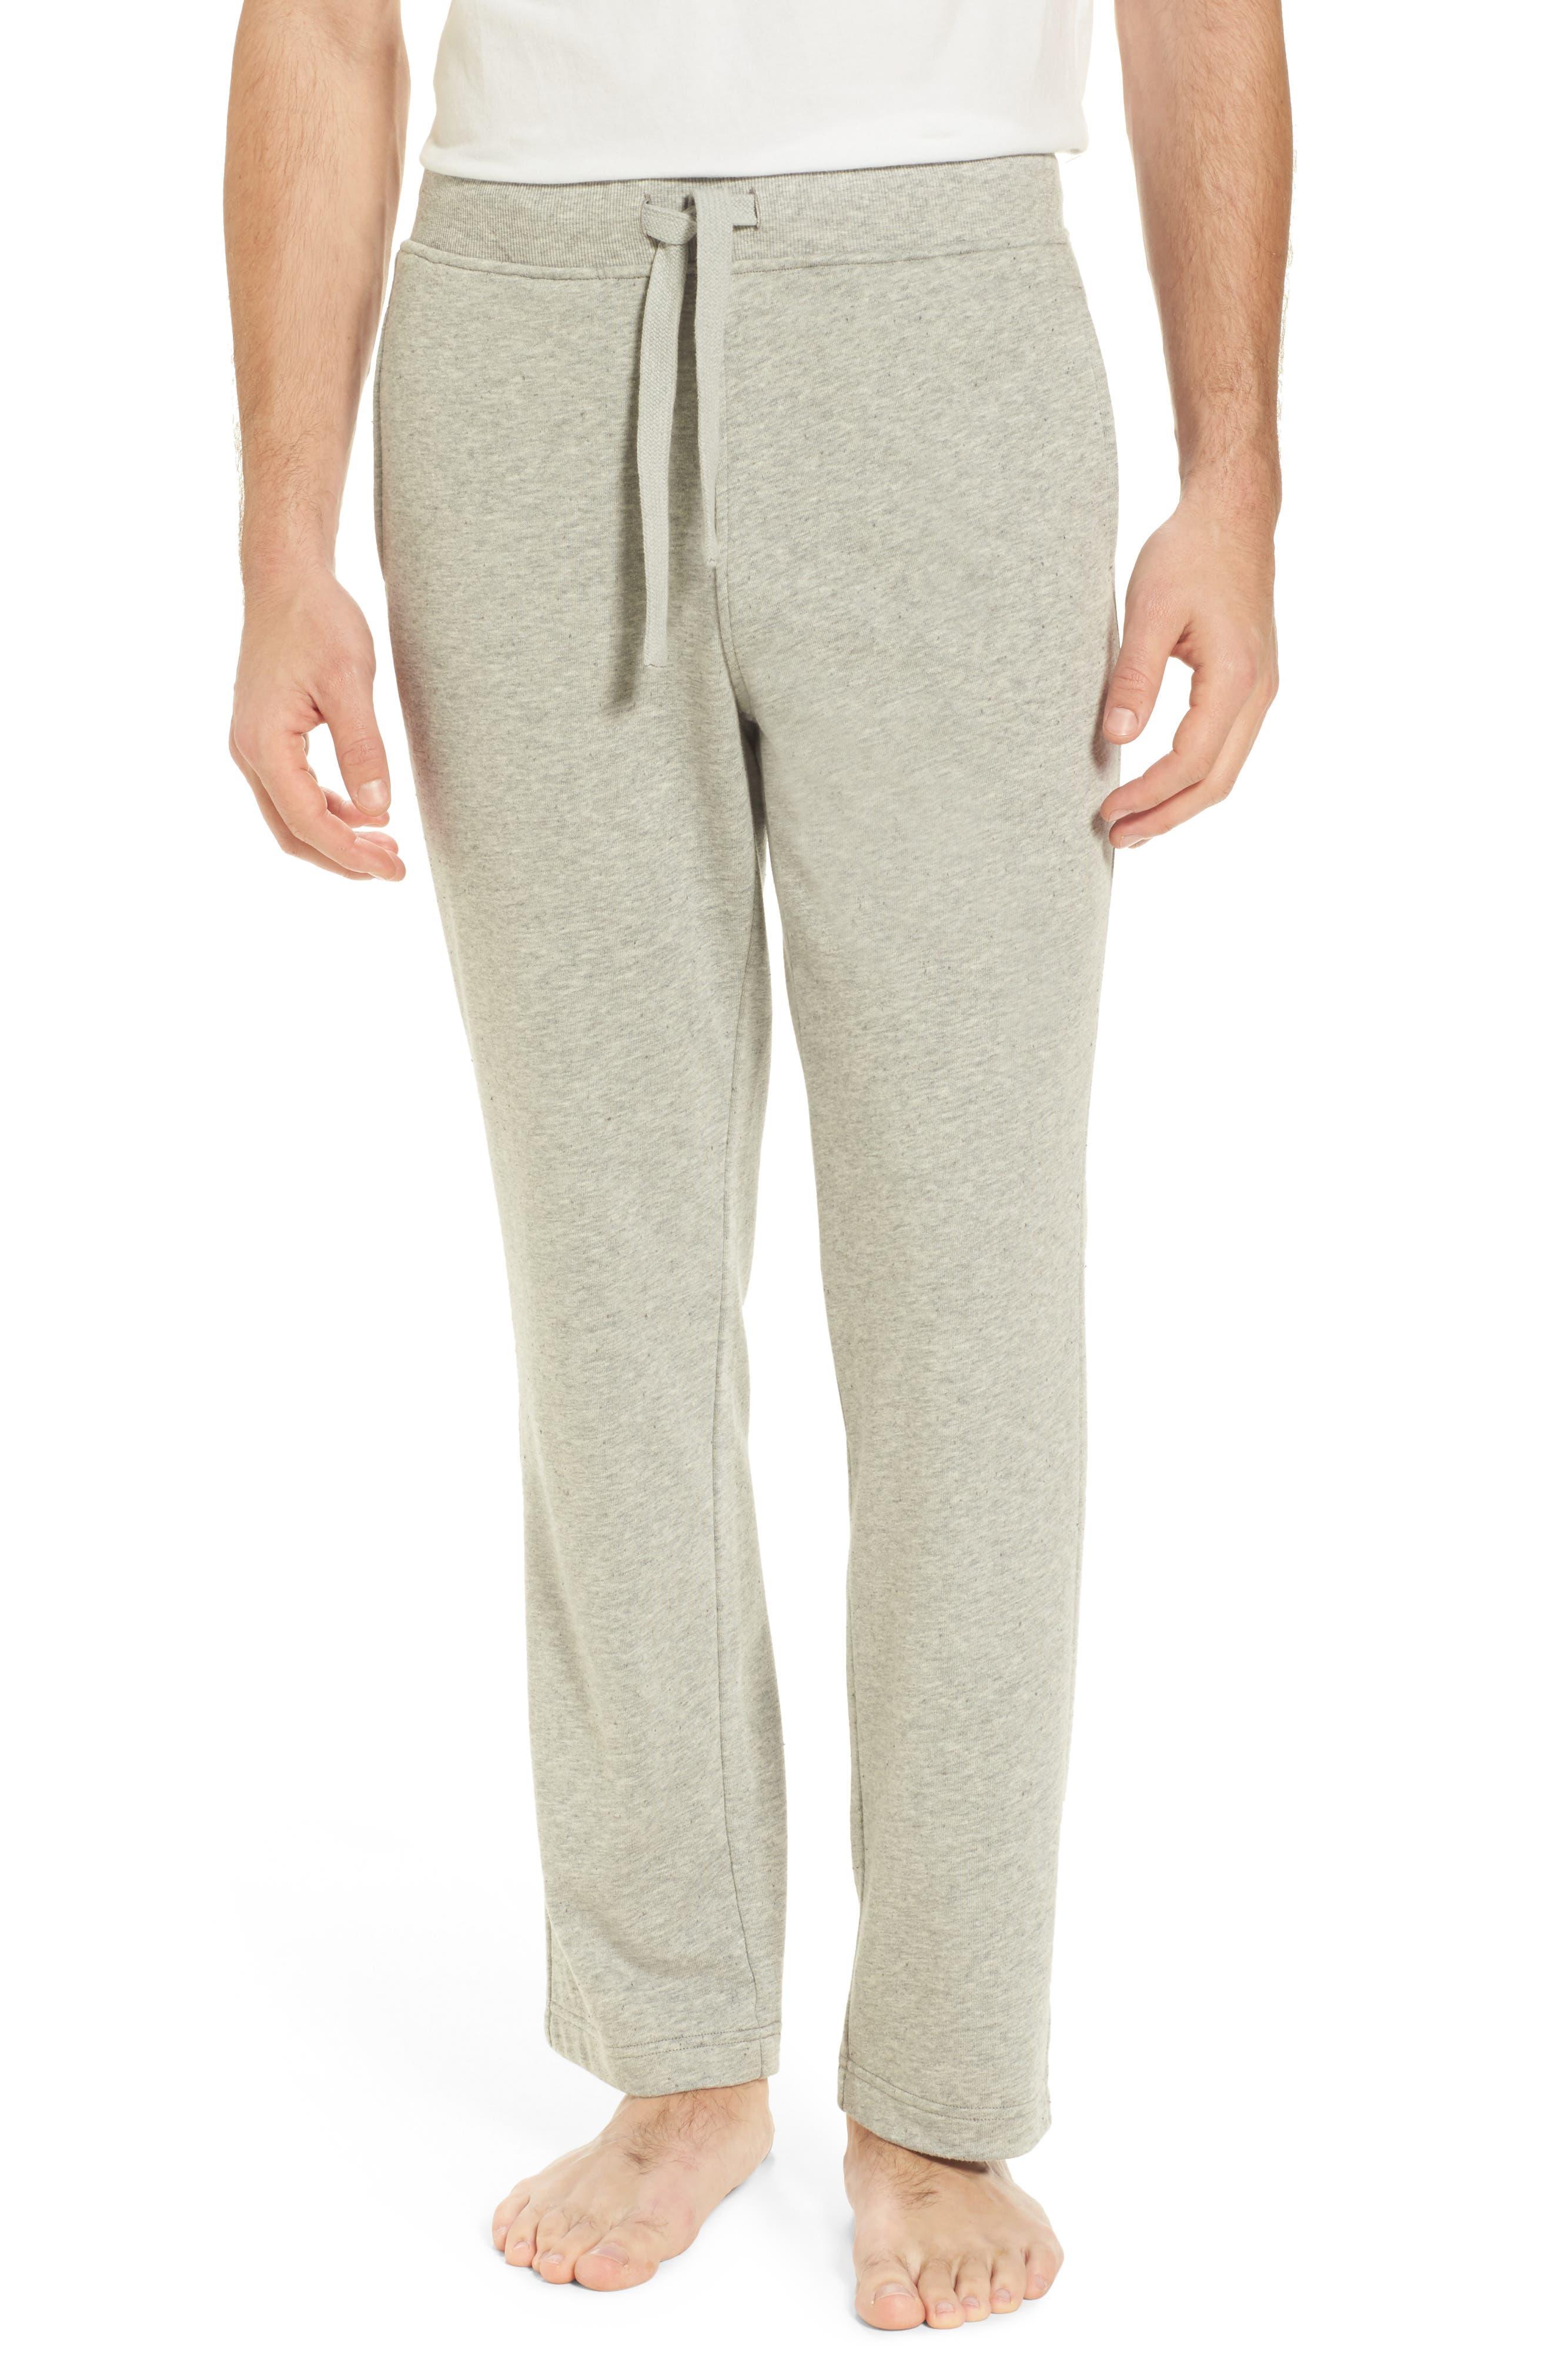 2eeaffb1faa Men's UGG® Joggers & Sweatpants | Nordstrom